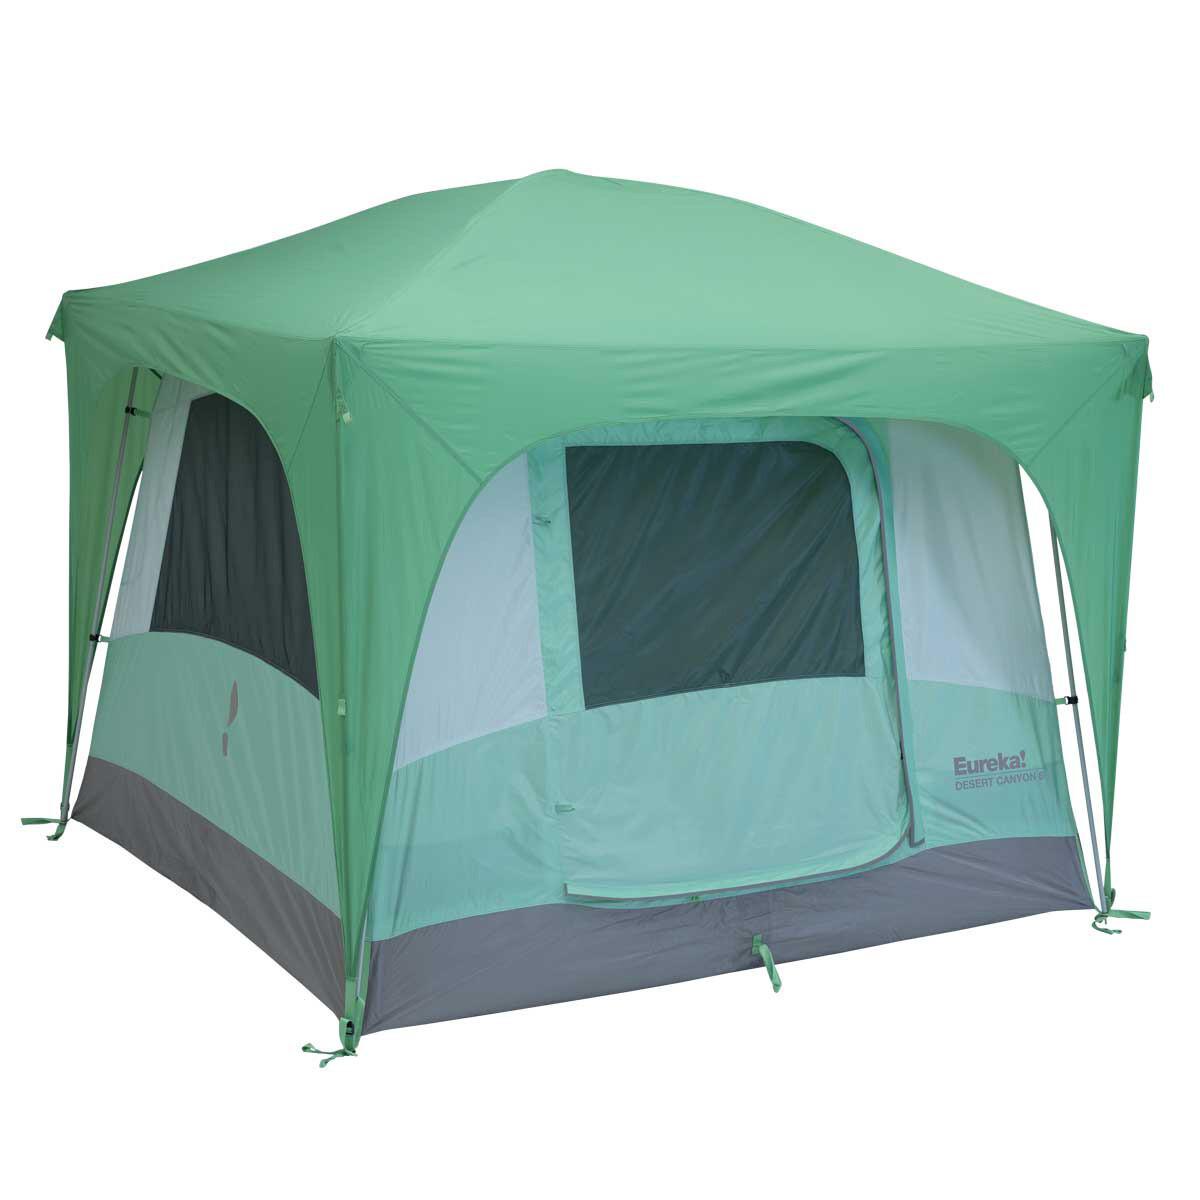 Eureka Desert Canuon 6 Person Tent